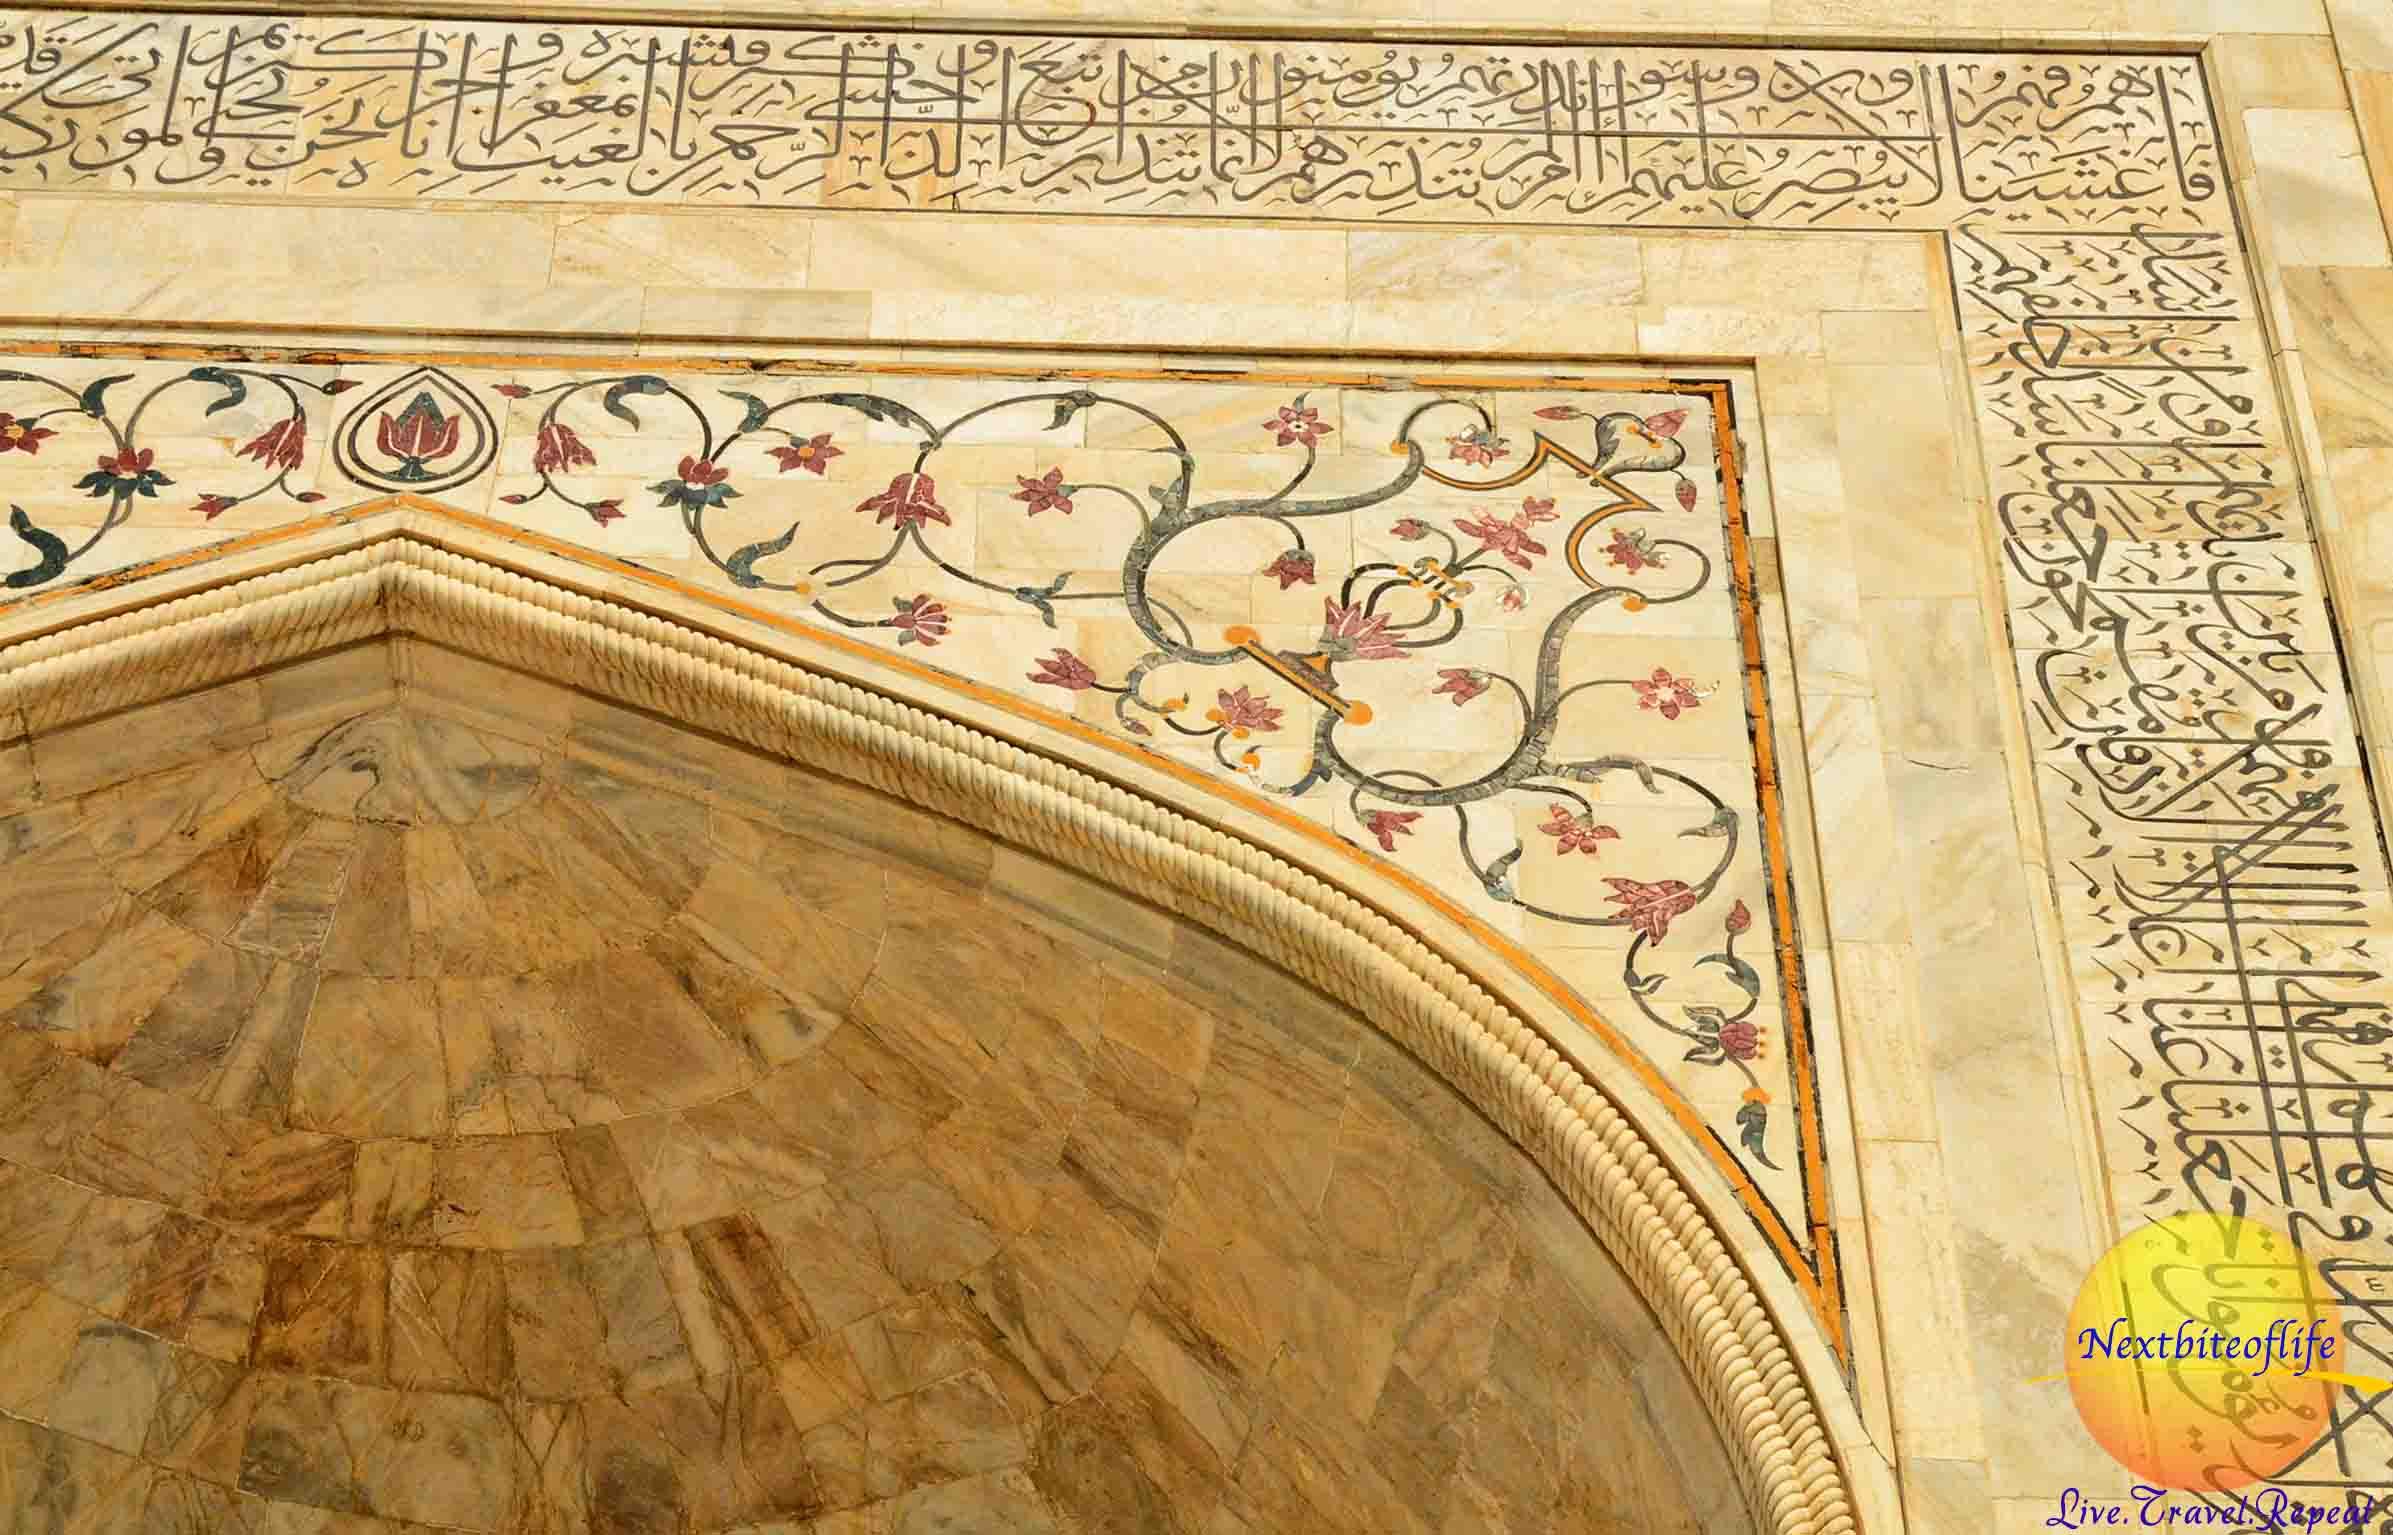 Taj Mahal, India - Magnificent Wonder Of The World - Nextbiteoflife